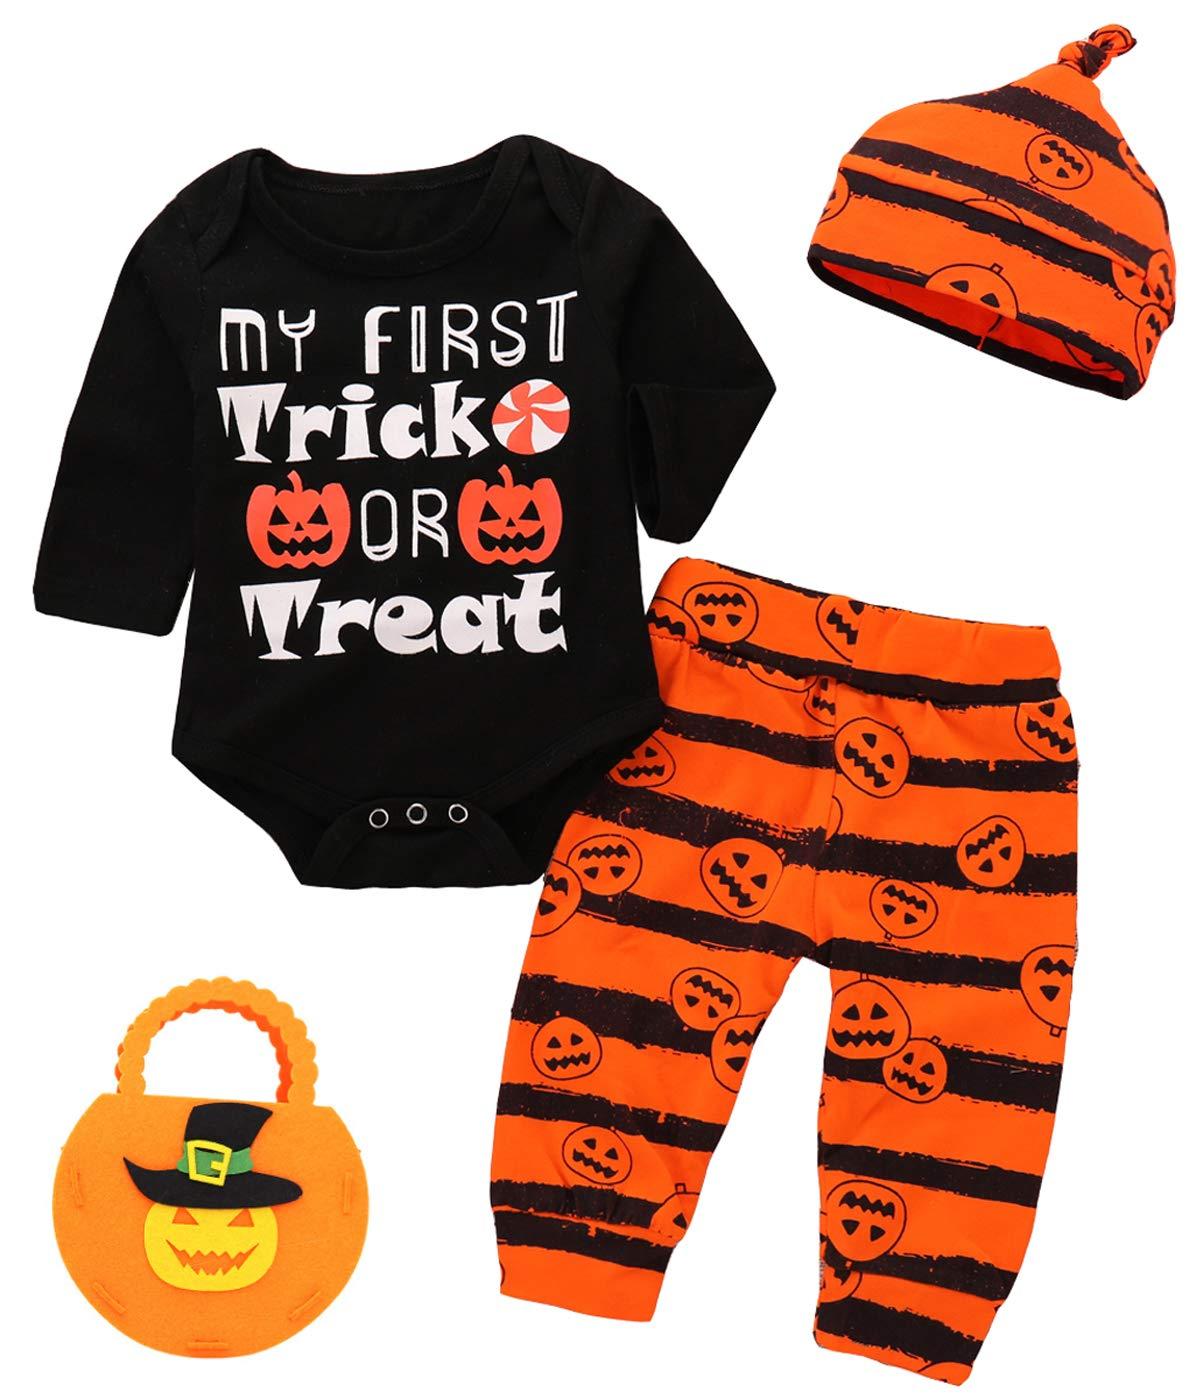 Halloween 4Pcs Outfit Set Baby Boy Girls Pumpkin Bodysuit with Candy Bag (Black, 3-6 Months)